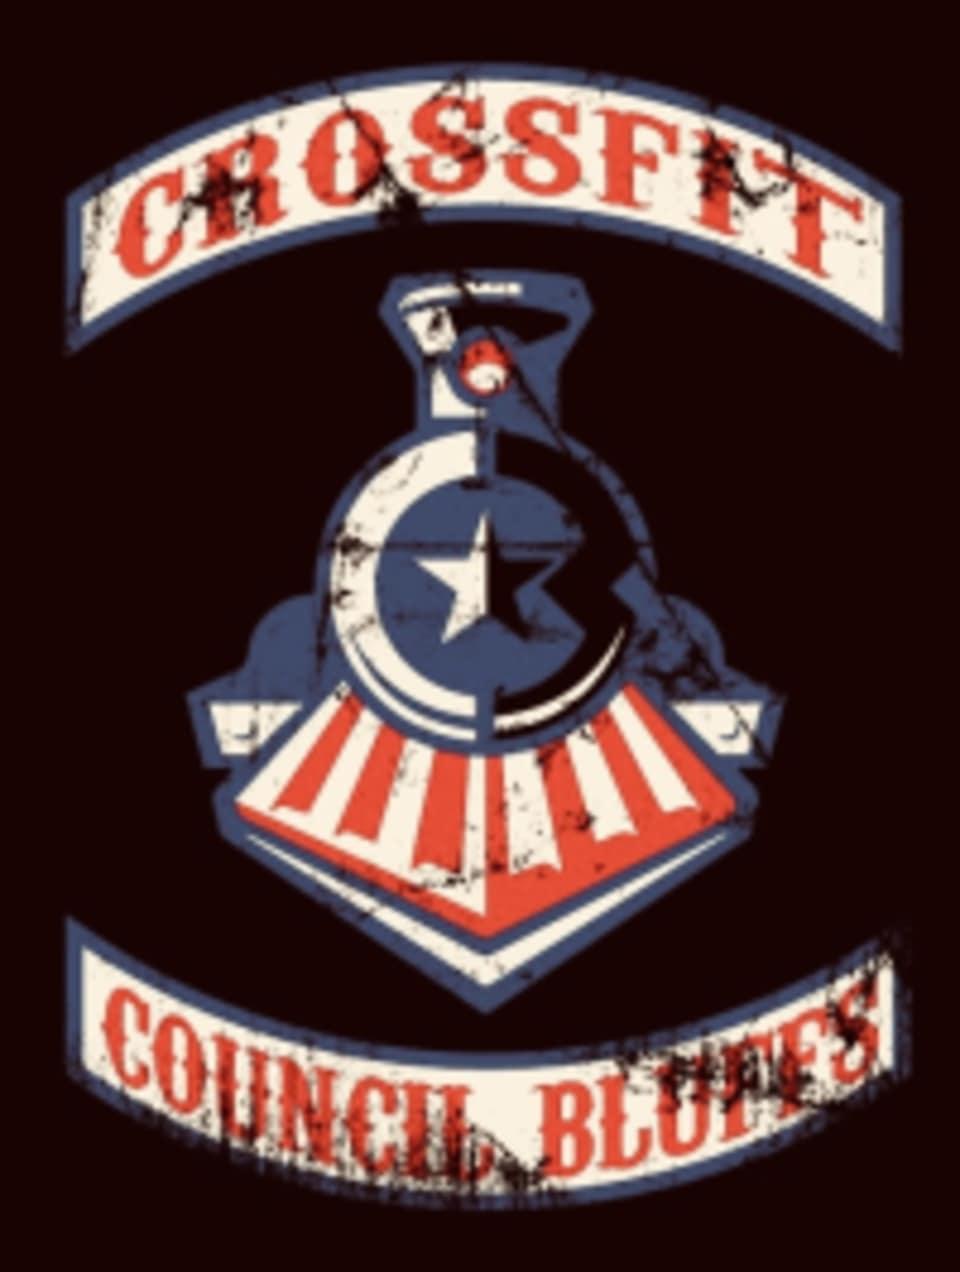 CrossFit Council Bluffs logo